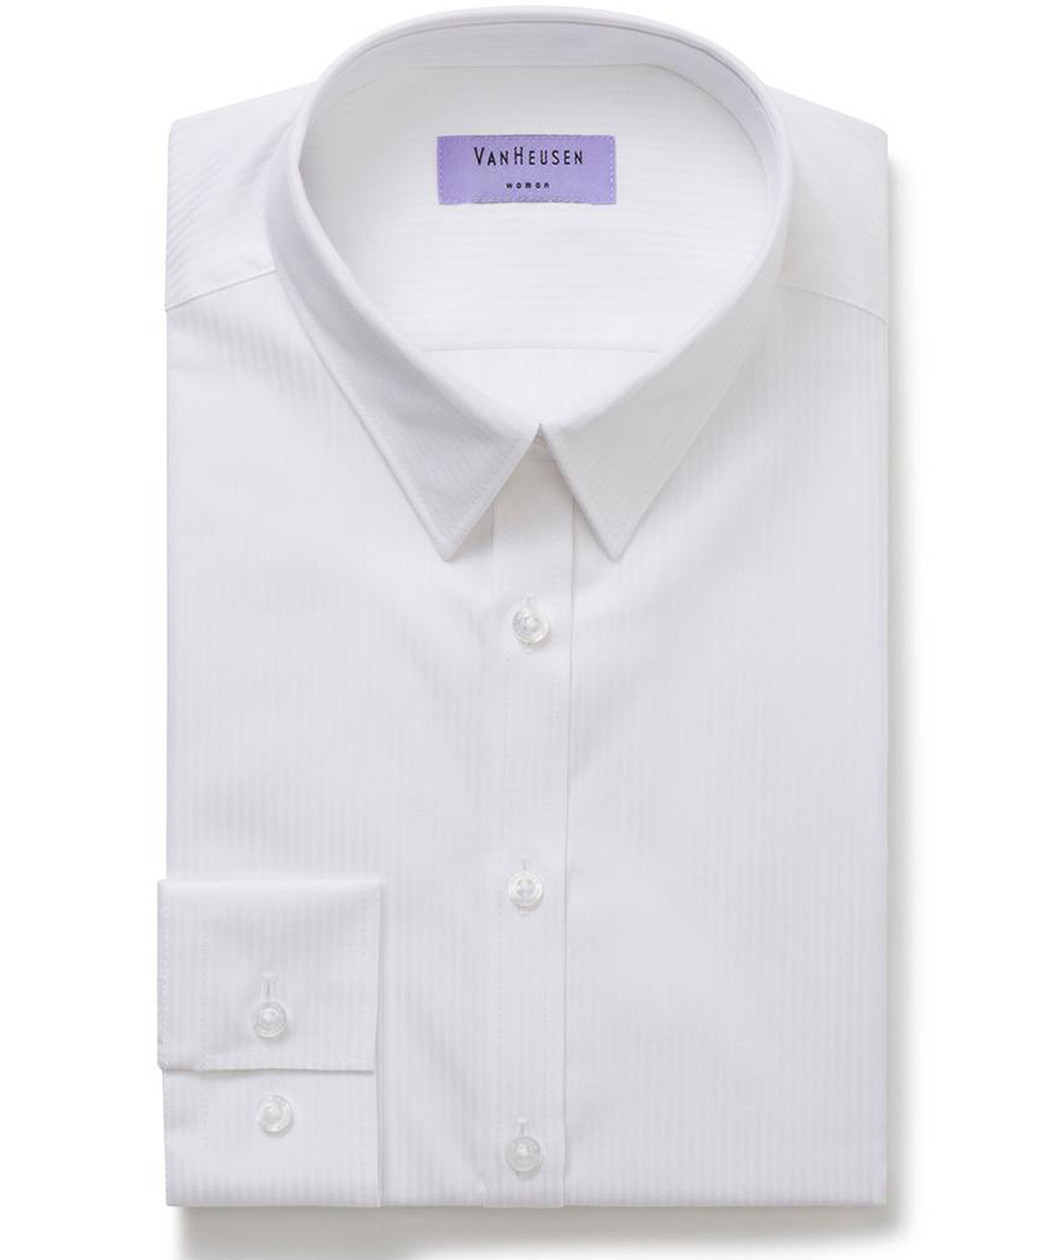 Van Heusen Womens Mini Herringbone Classic Fit Shirt